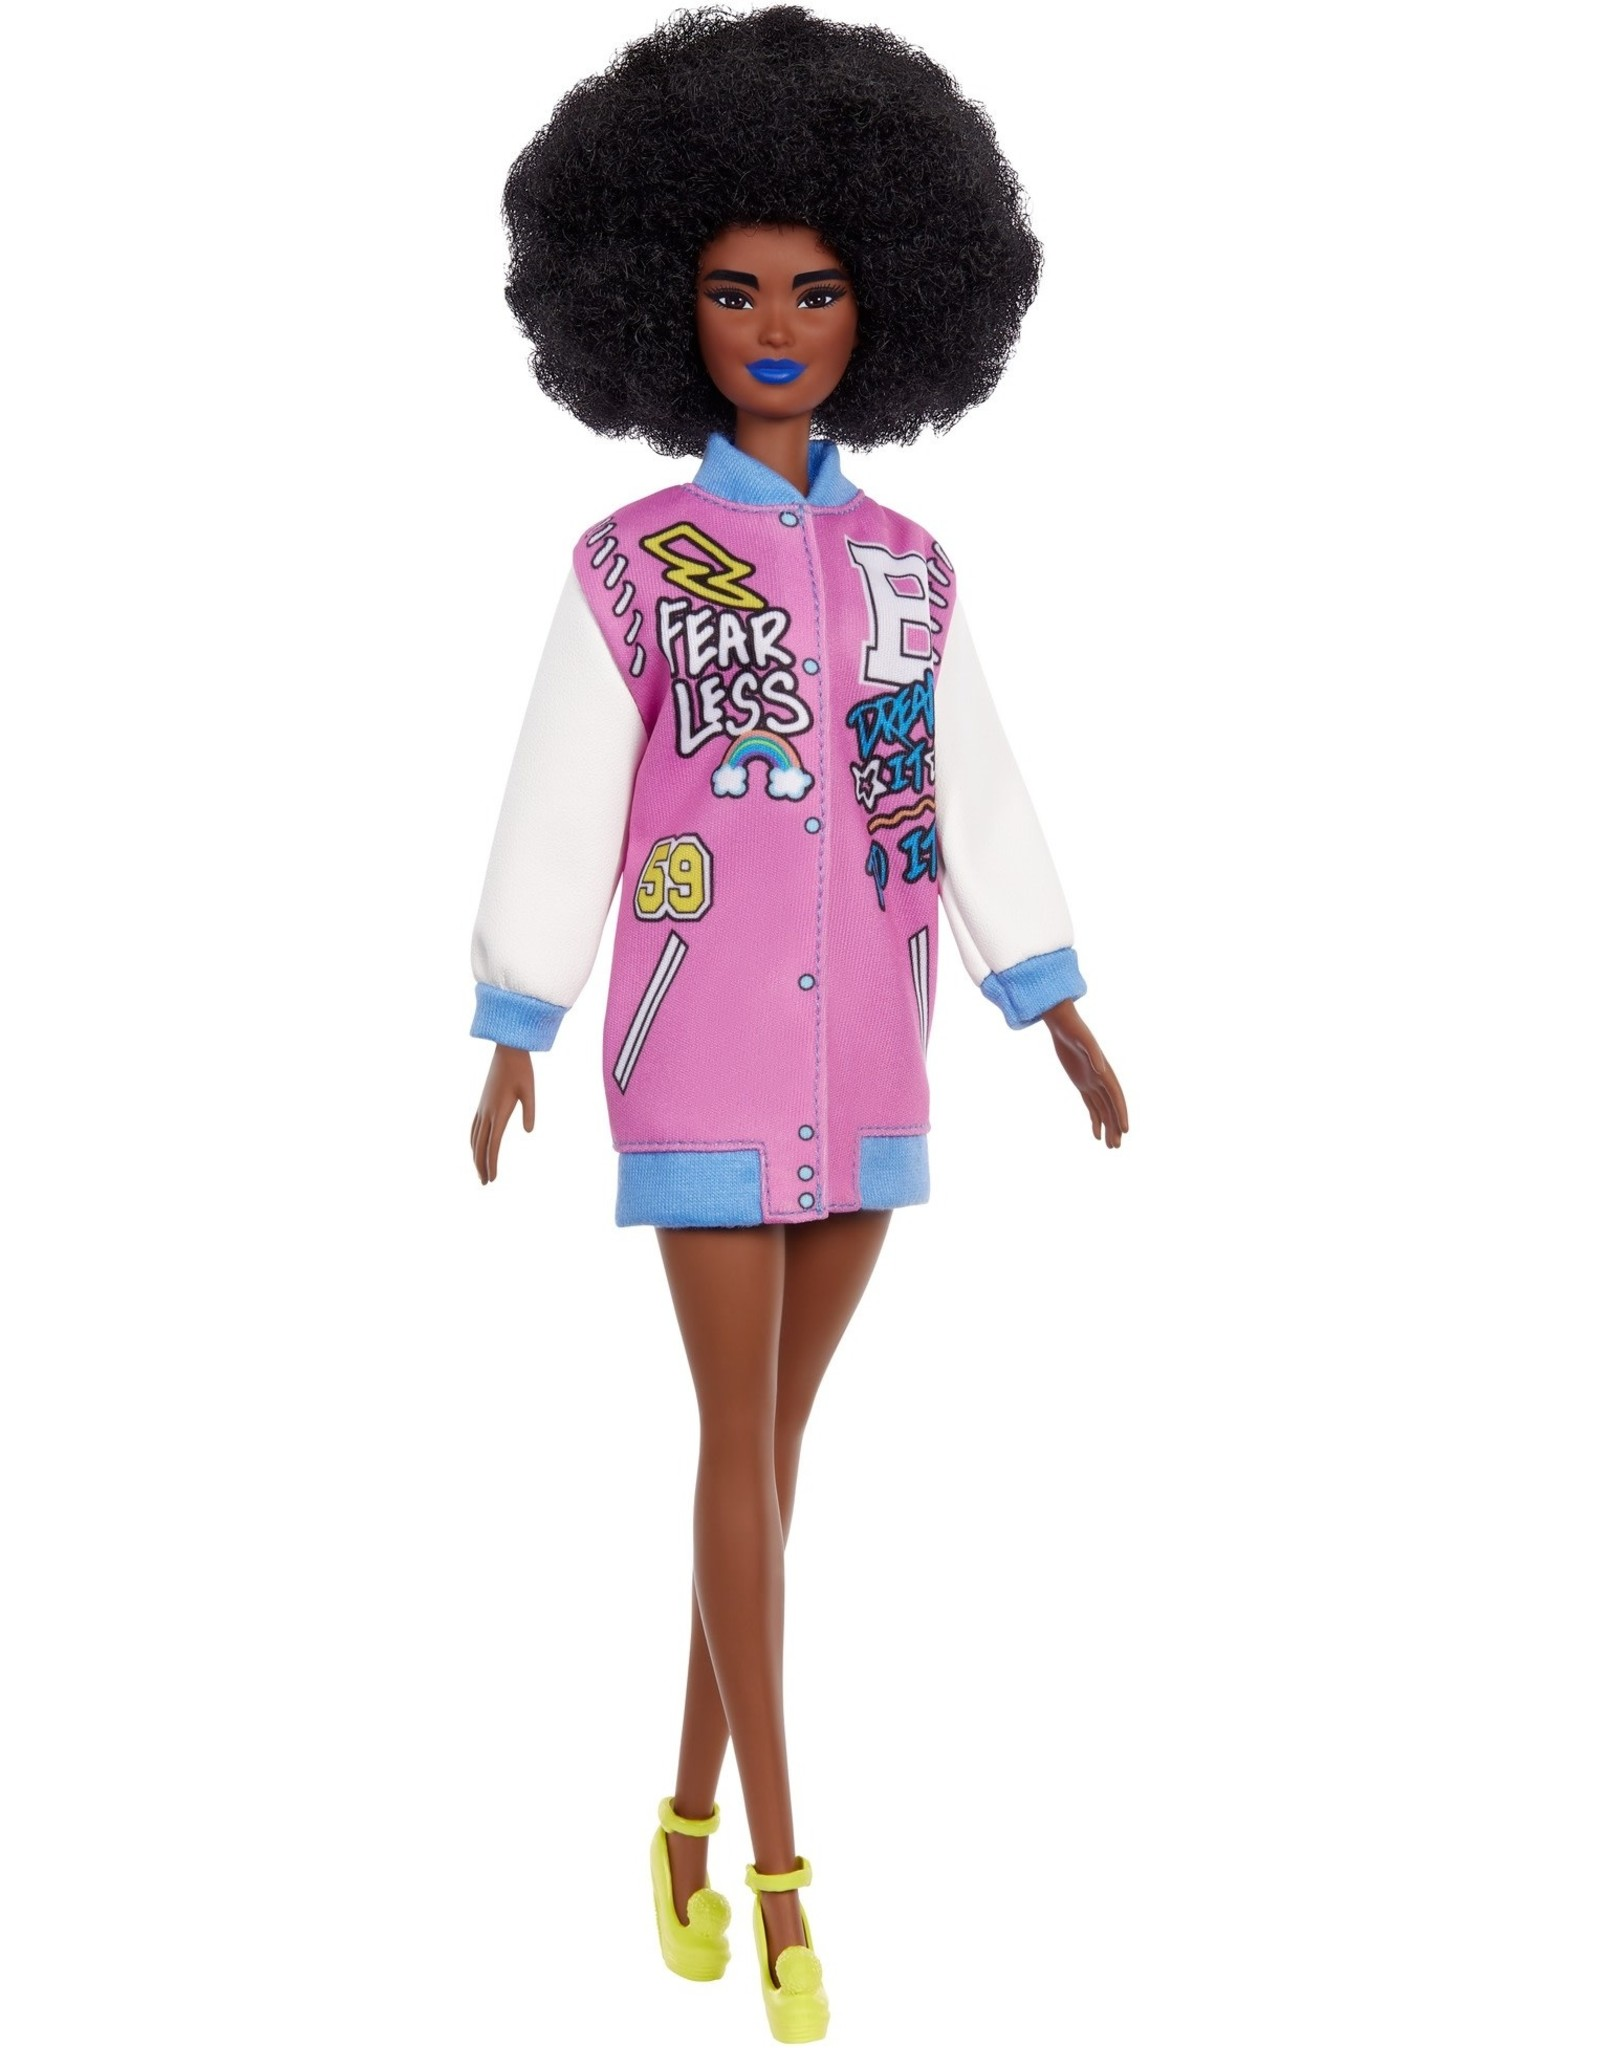 Barbie Barbie #156